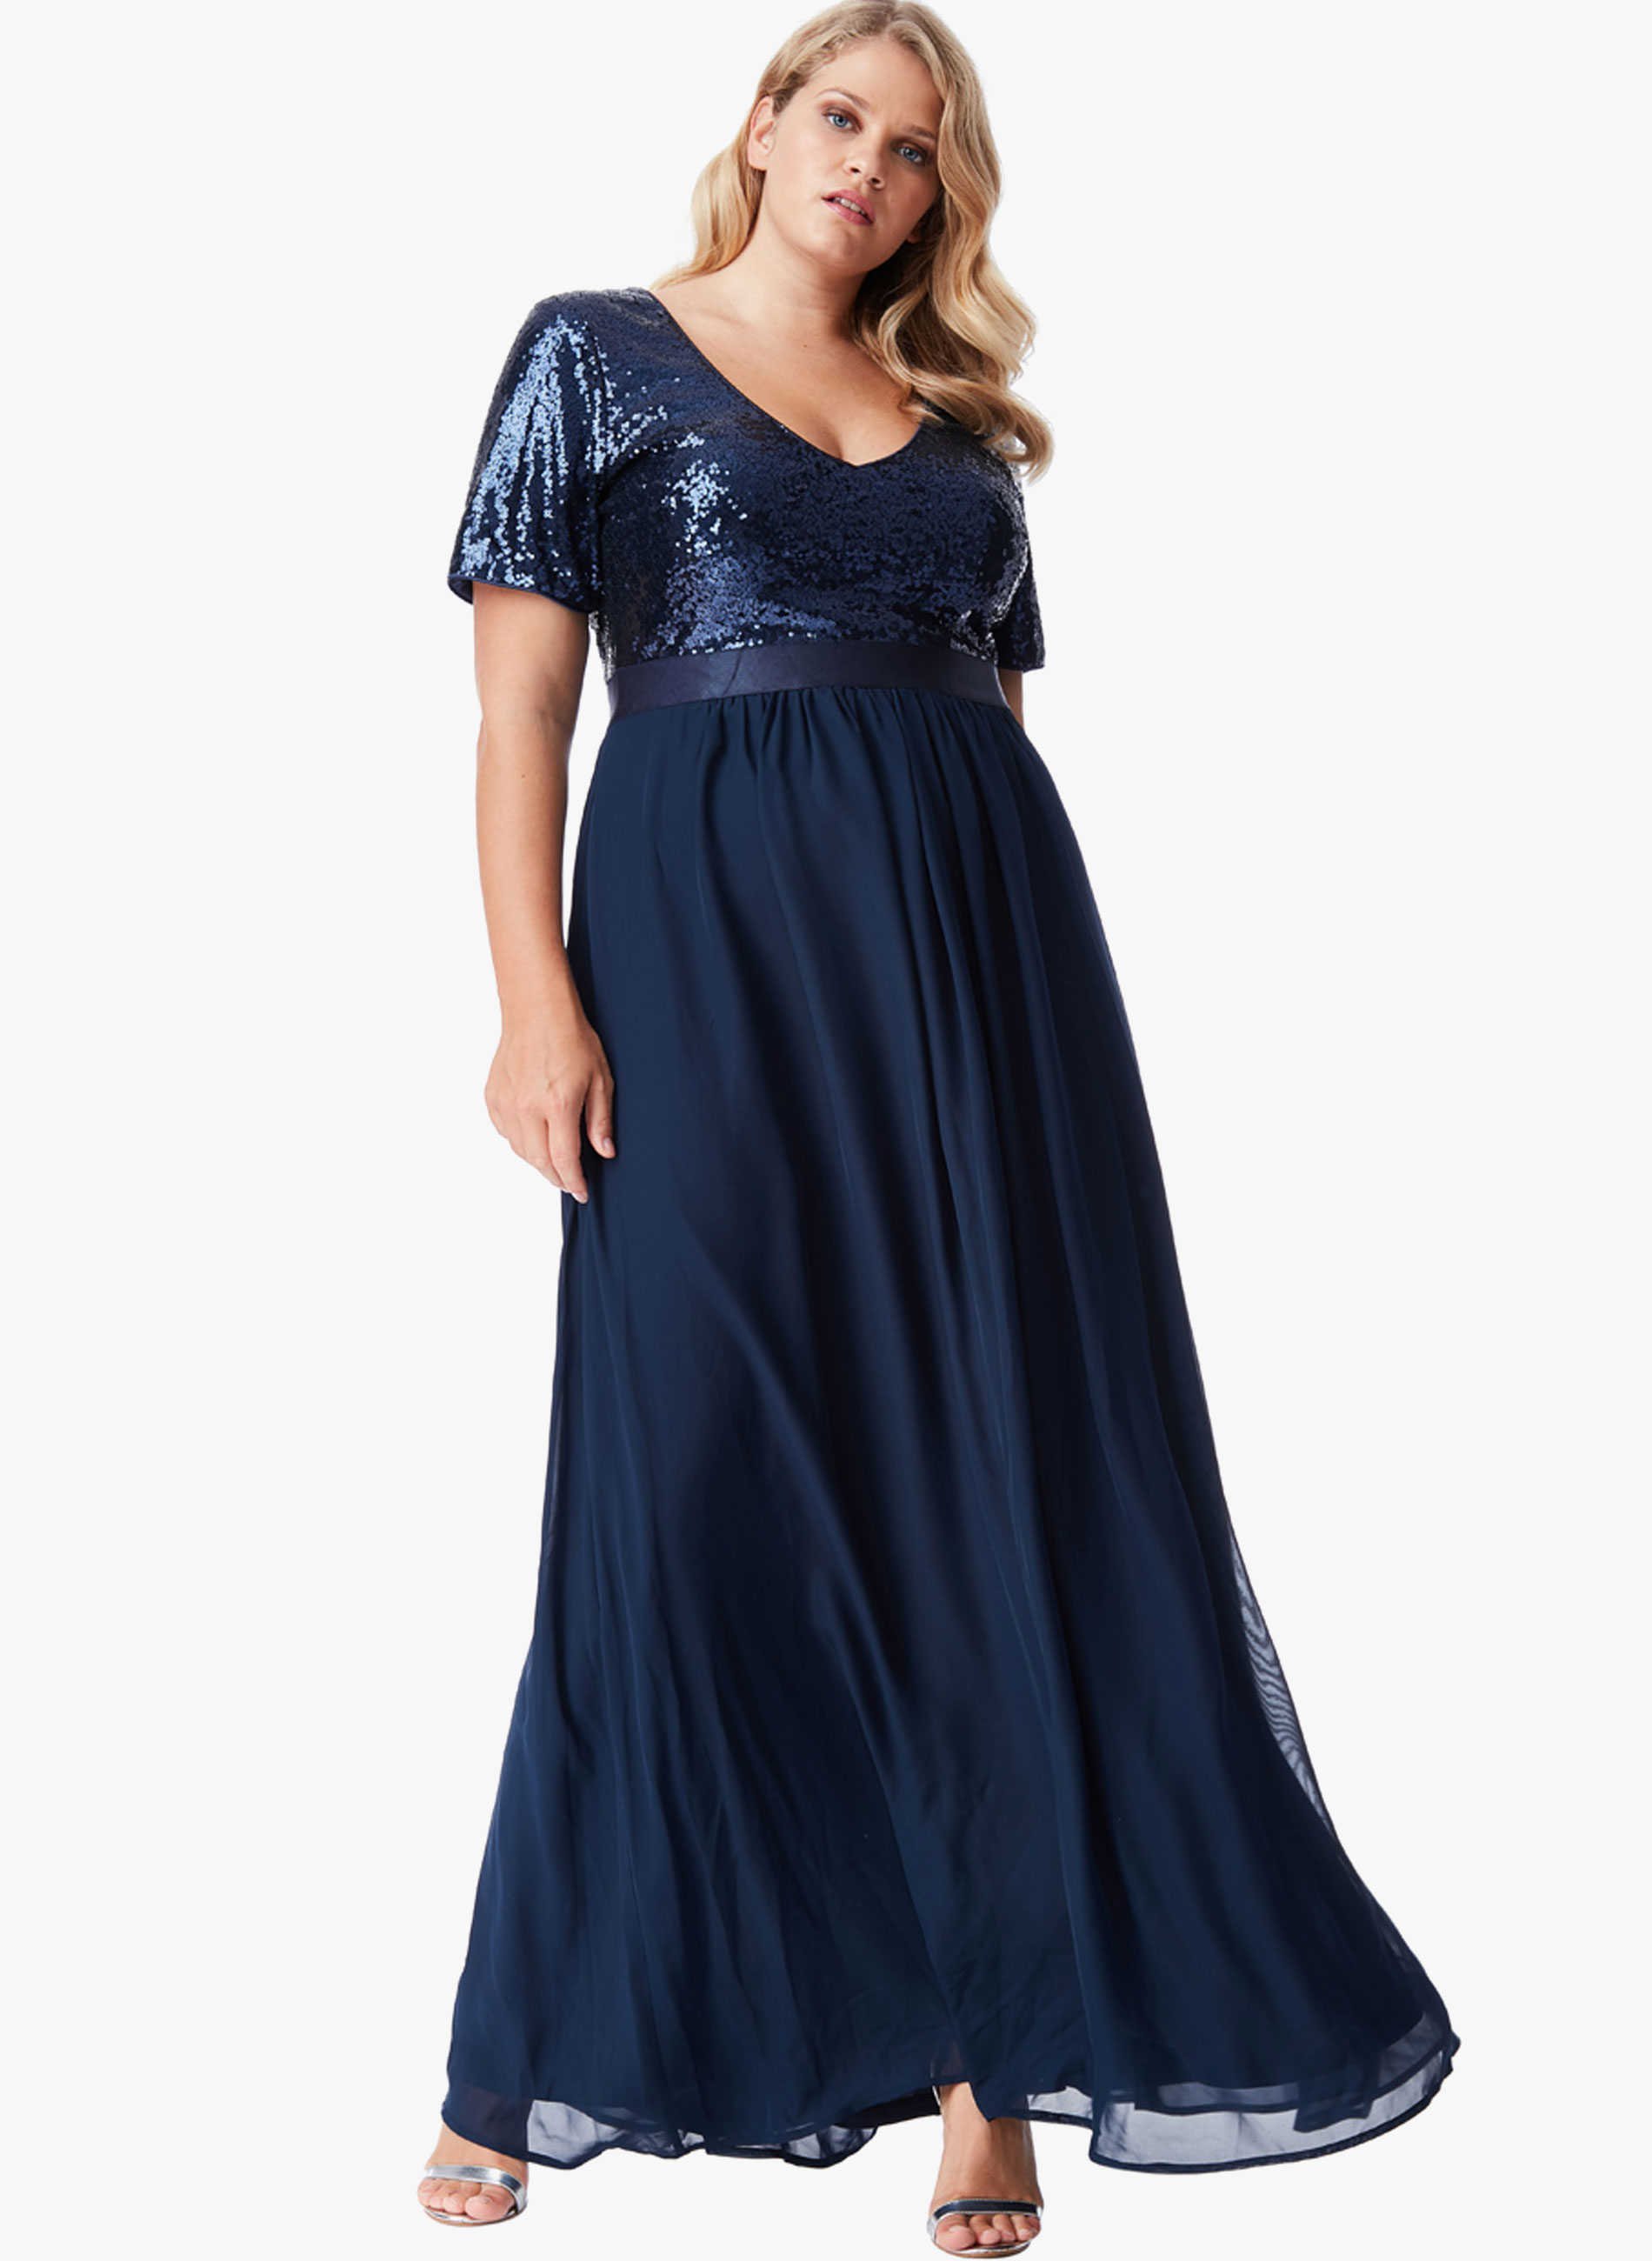 07cb5844b468 ΜΕΓΑΛΑ ΜΕΓΕΘΗ ΦΟΡΕΜΑΤΑ    Φόρεμα Μάξι Navy με Παγιέτα - Μόδα σε ...